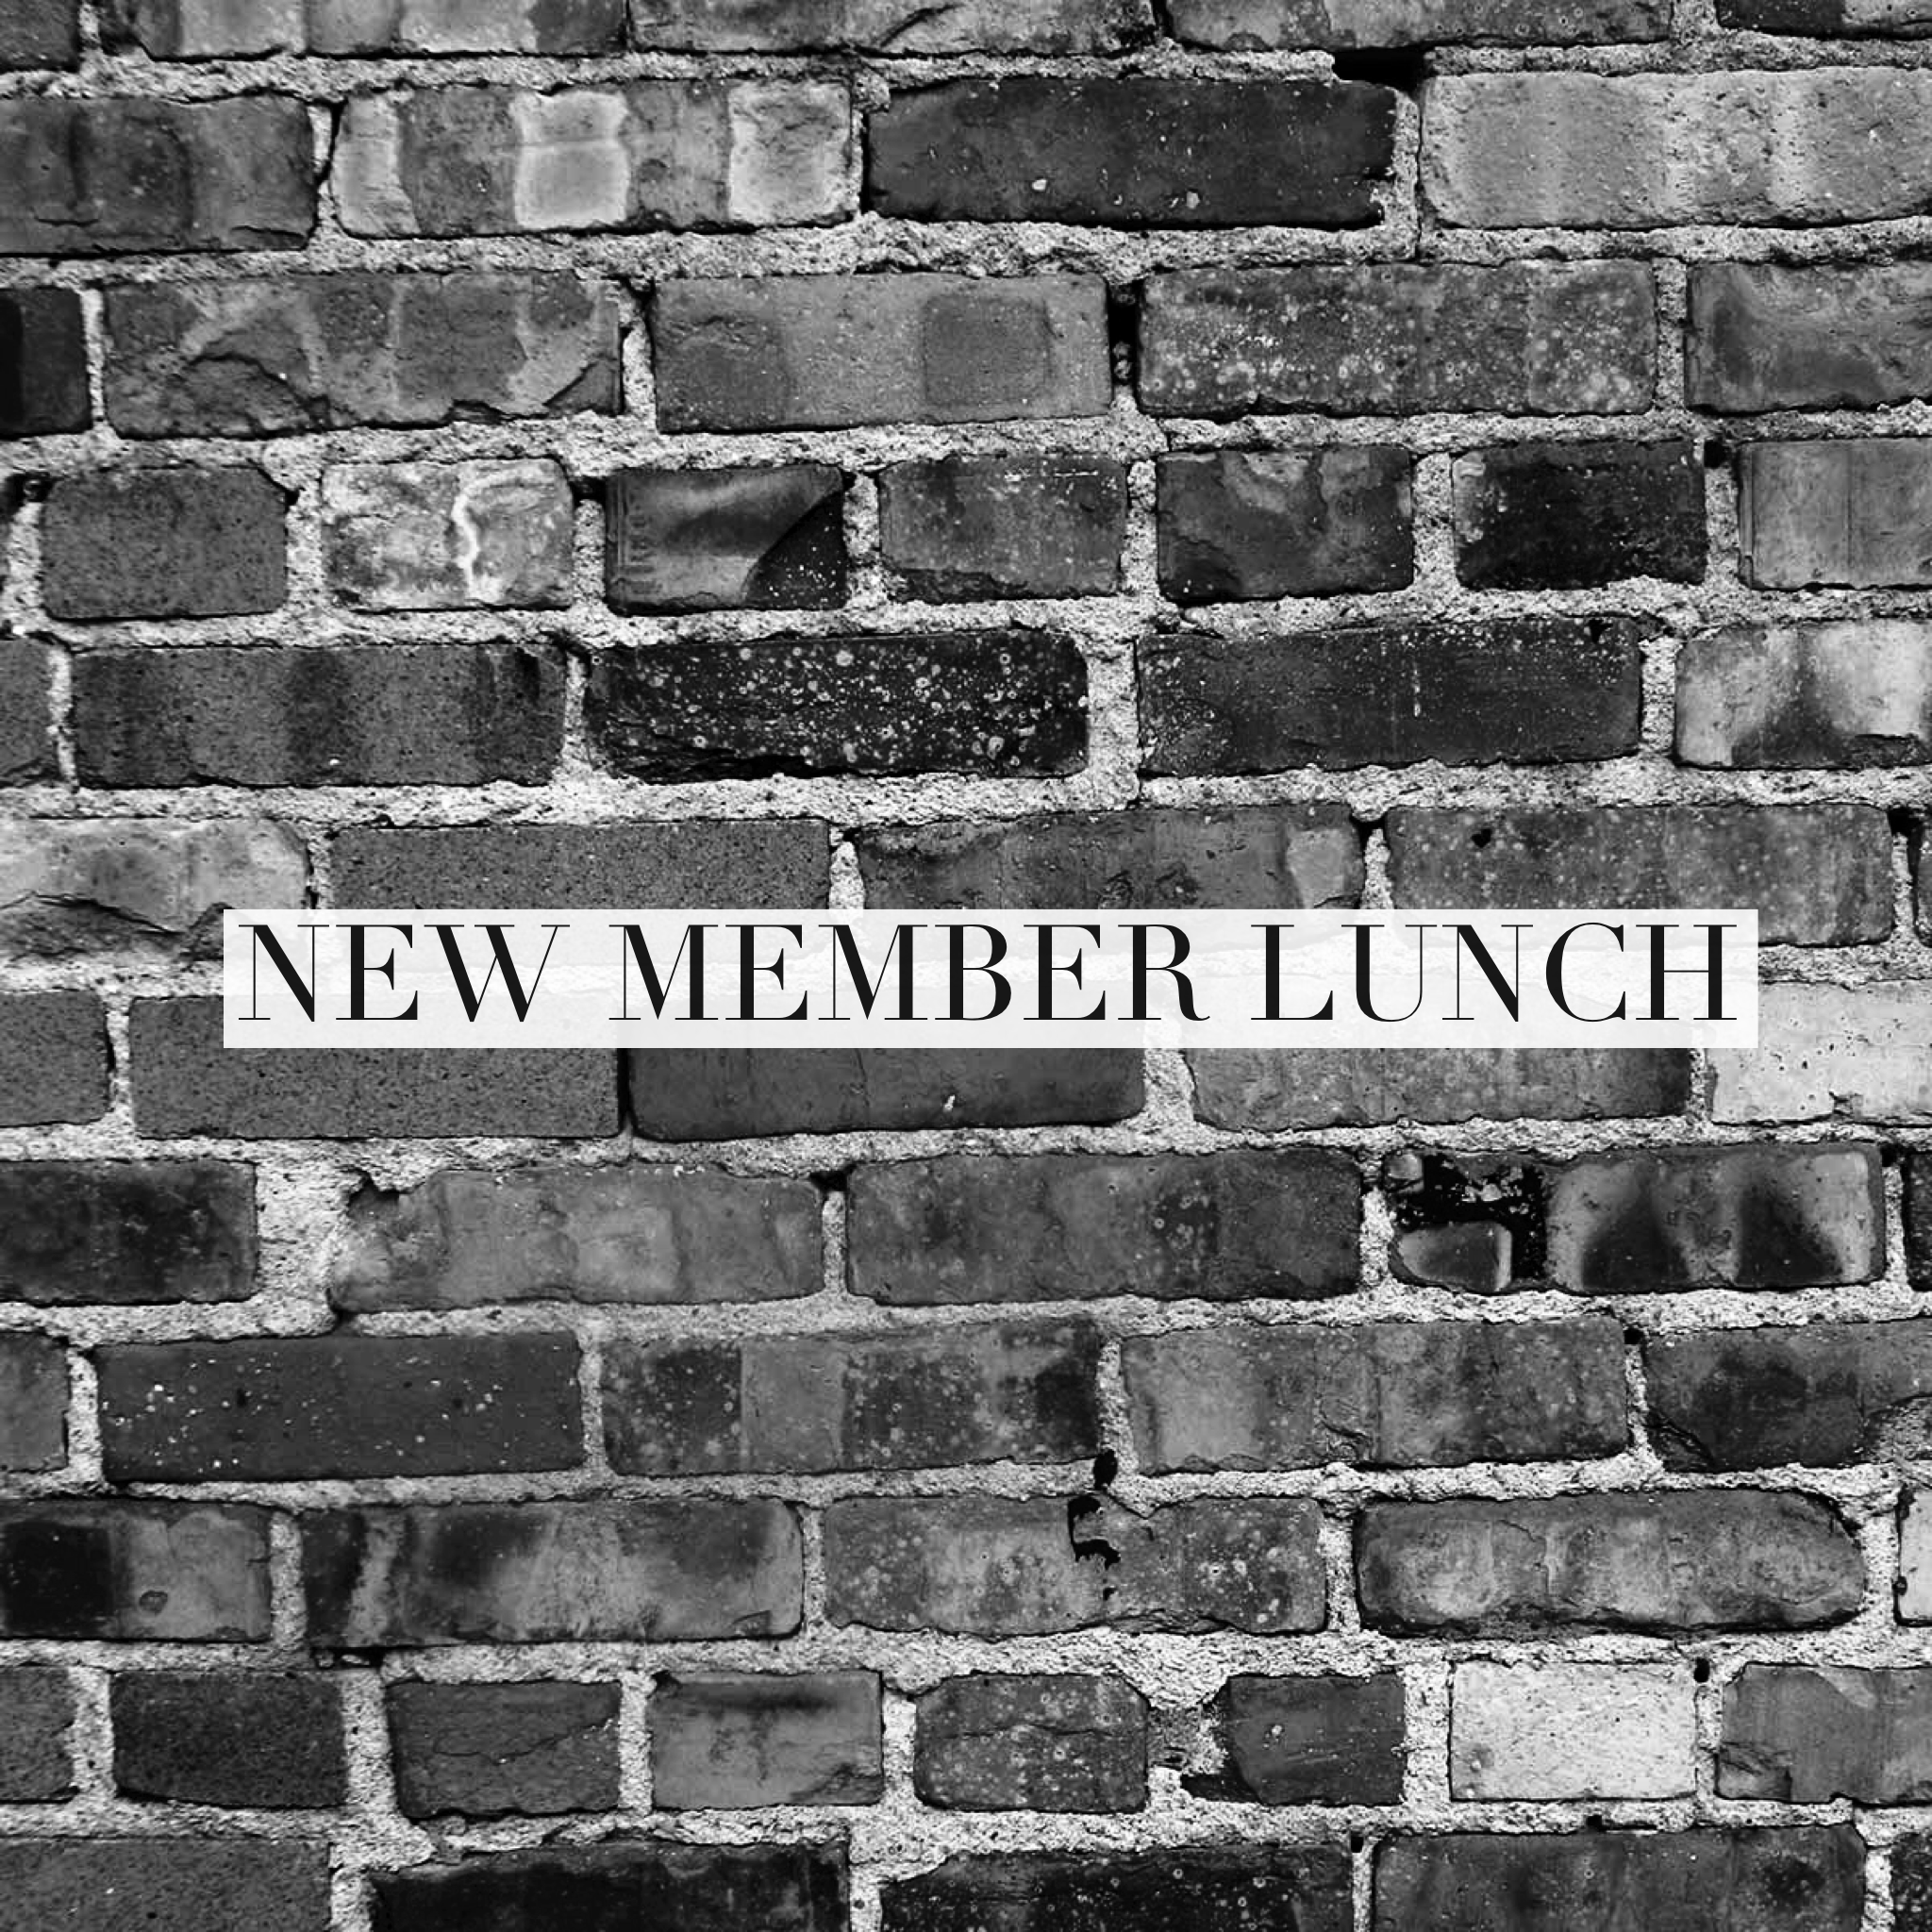 New Member Lunch